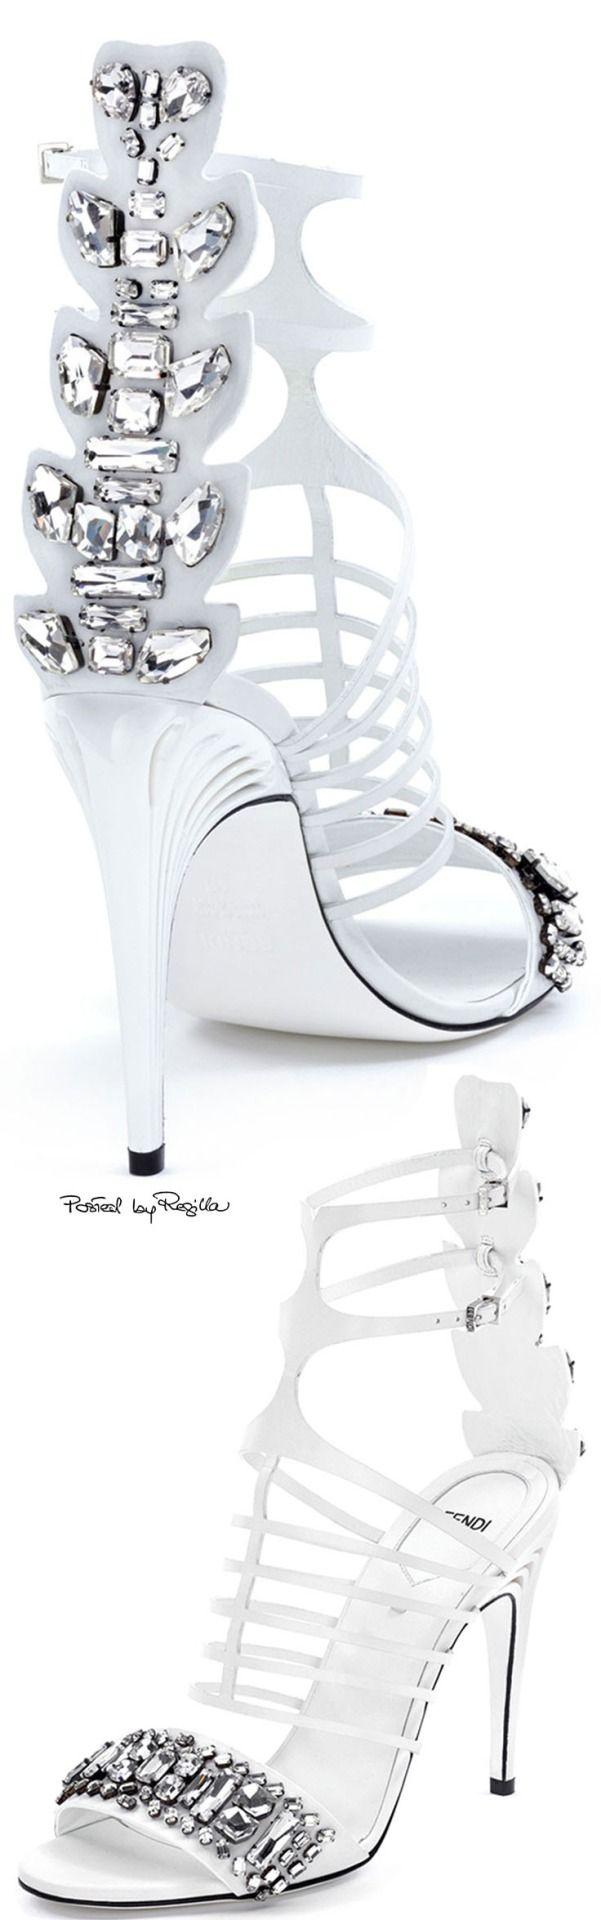 Fendi ~ White Leather Sandals w Crystal Embellished Heels 2015